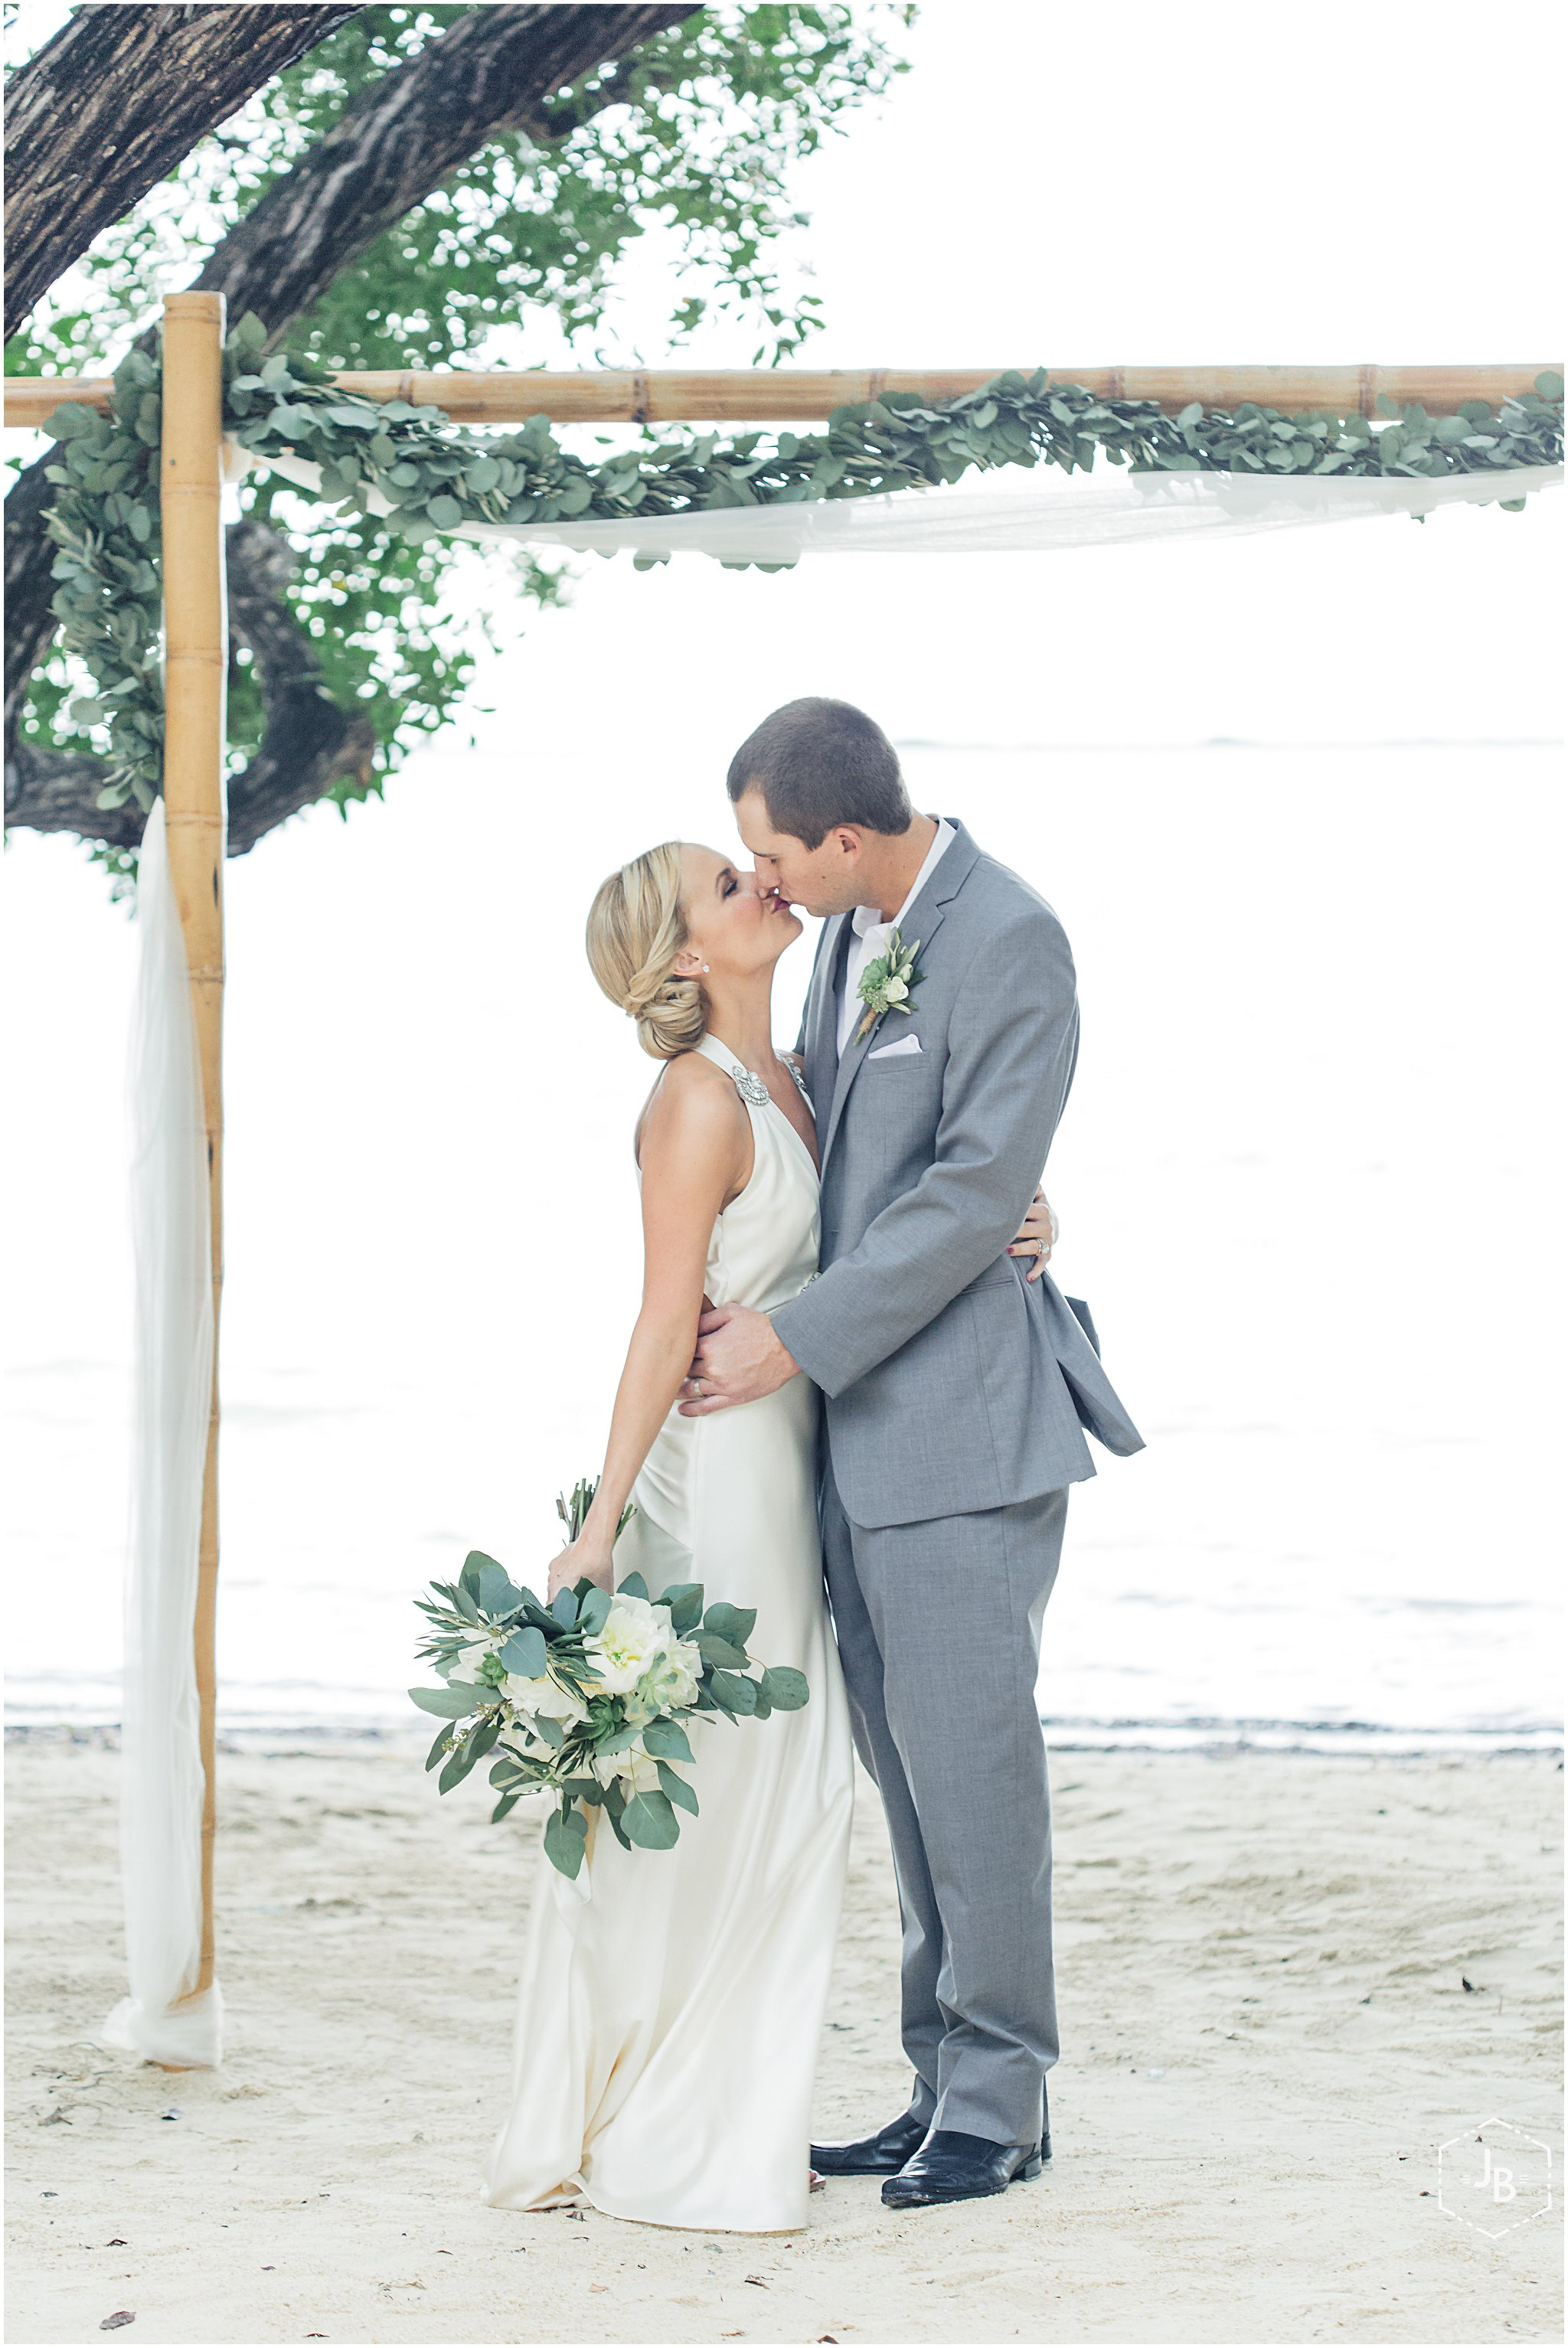 WeddingandEngagementFloridaPhotographer_1133.jpg